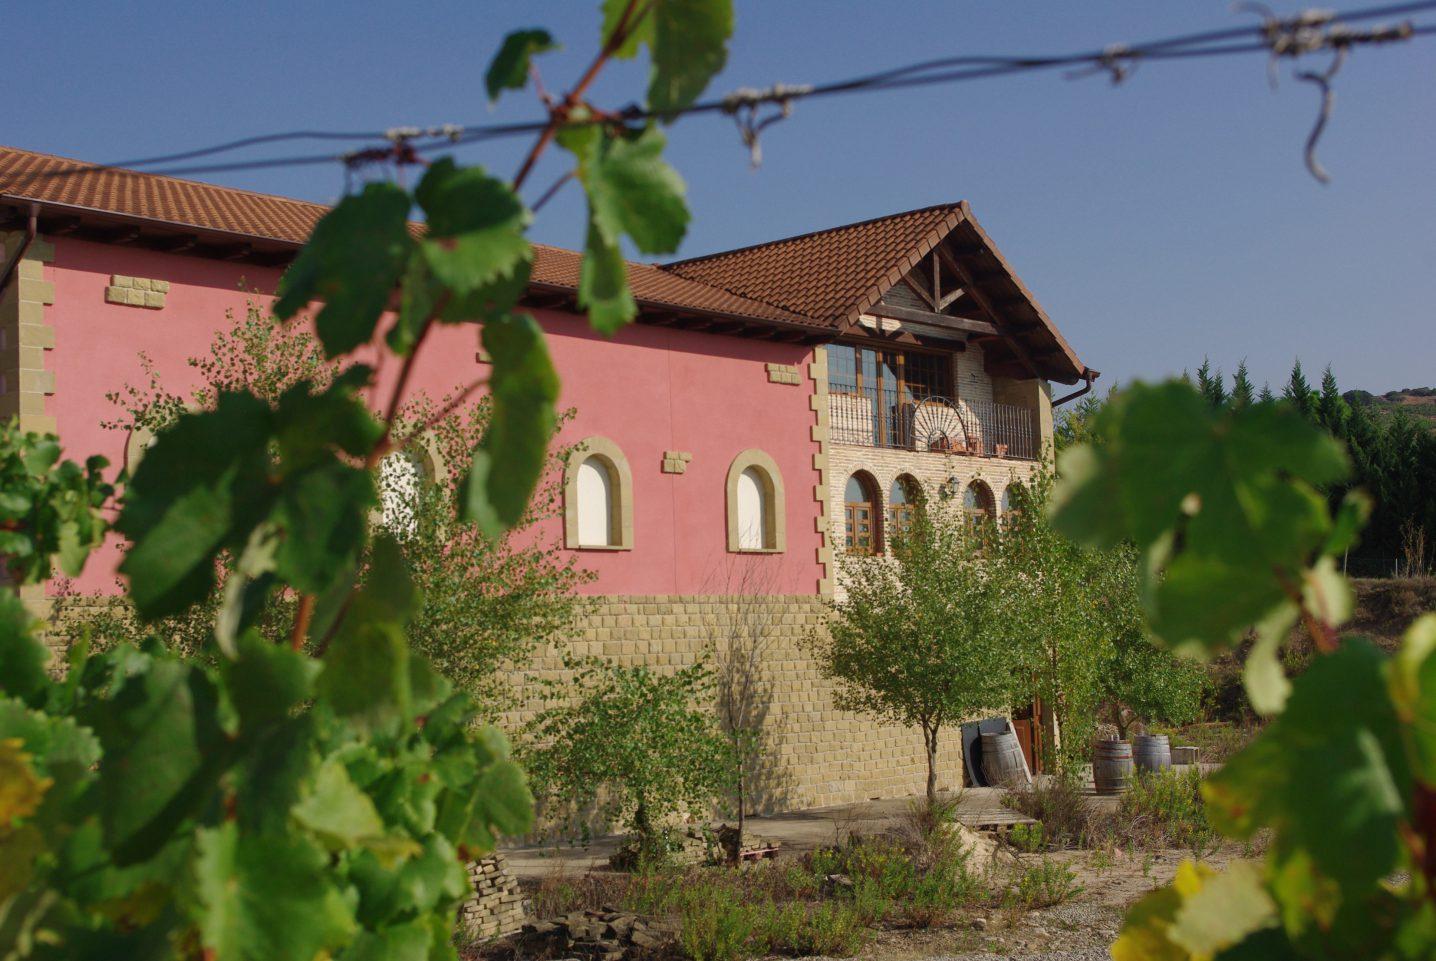 Bodega Cenicero Vitícola fabricante de Vino Rioja